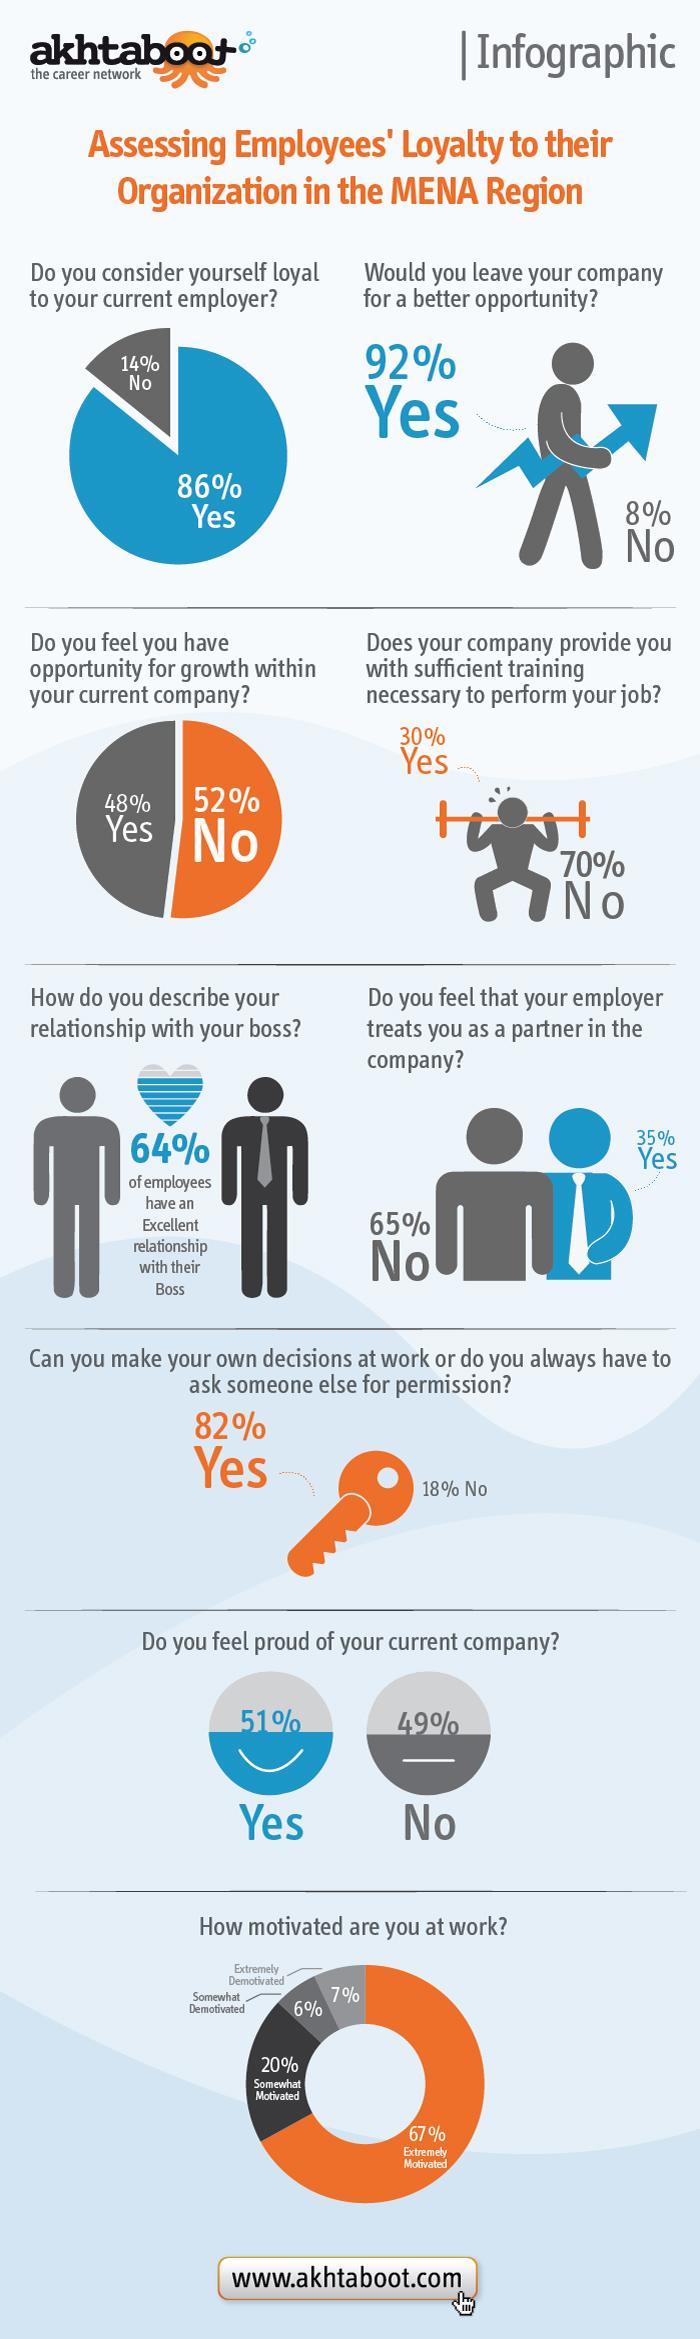 infographic_2014_Q2